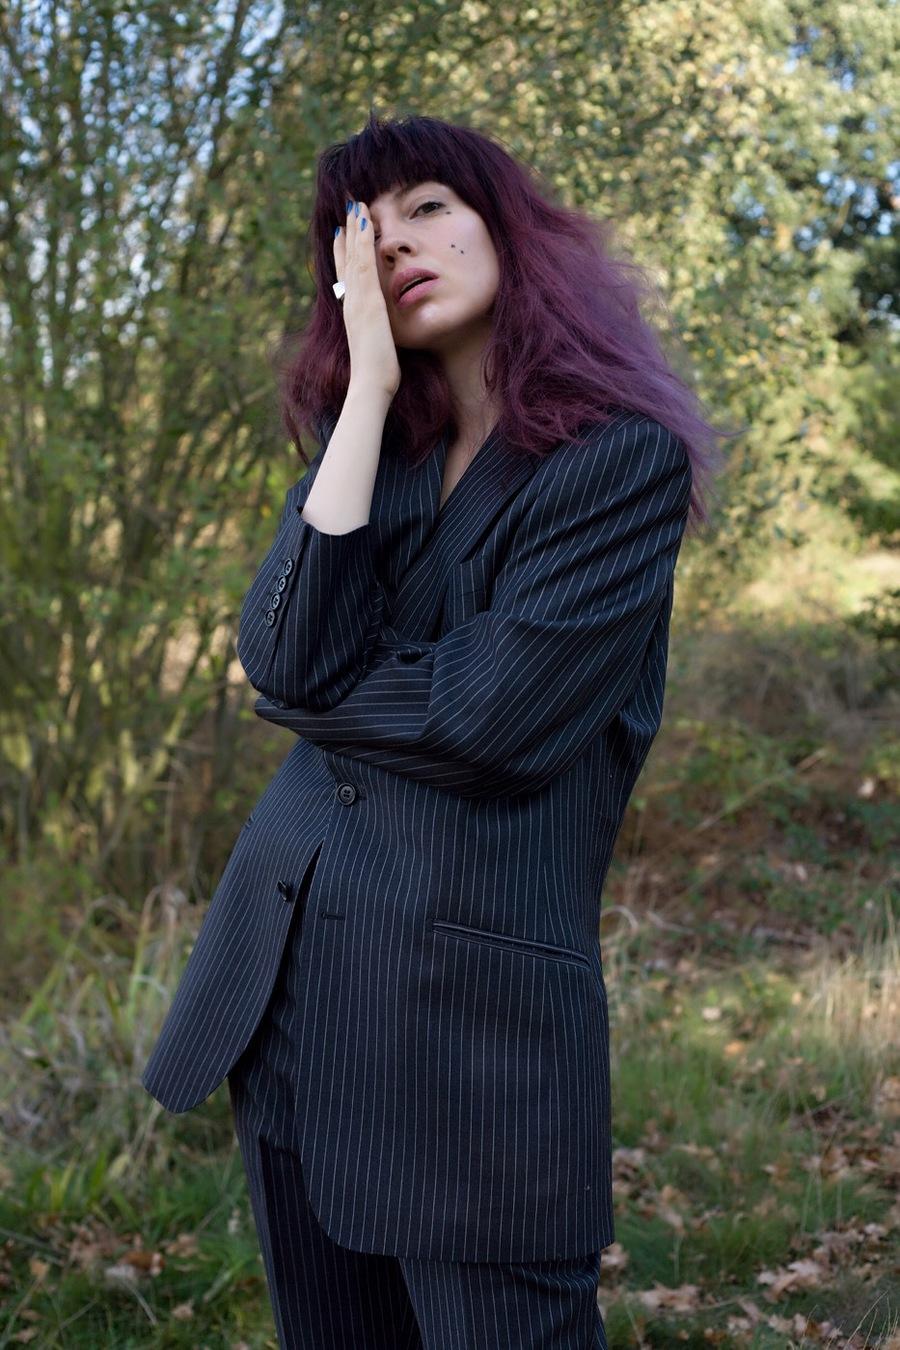 FASHION 2018 by @youinthelens / Model este, Makeup by este, Stylist este, Hair styling by este / Uploaded 9th December 2018 @ 01:35 PM